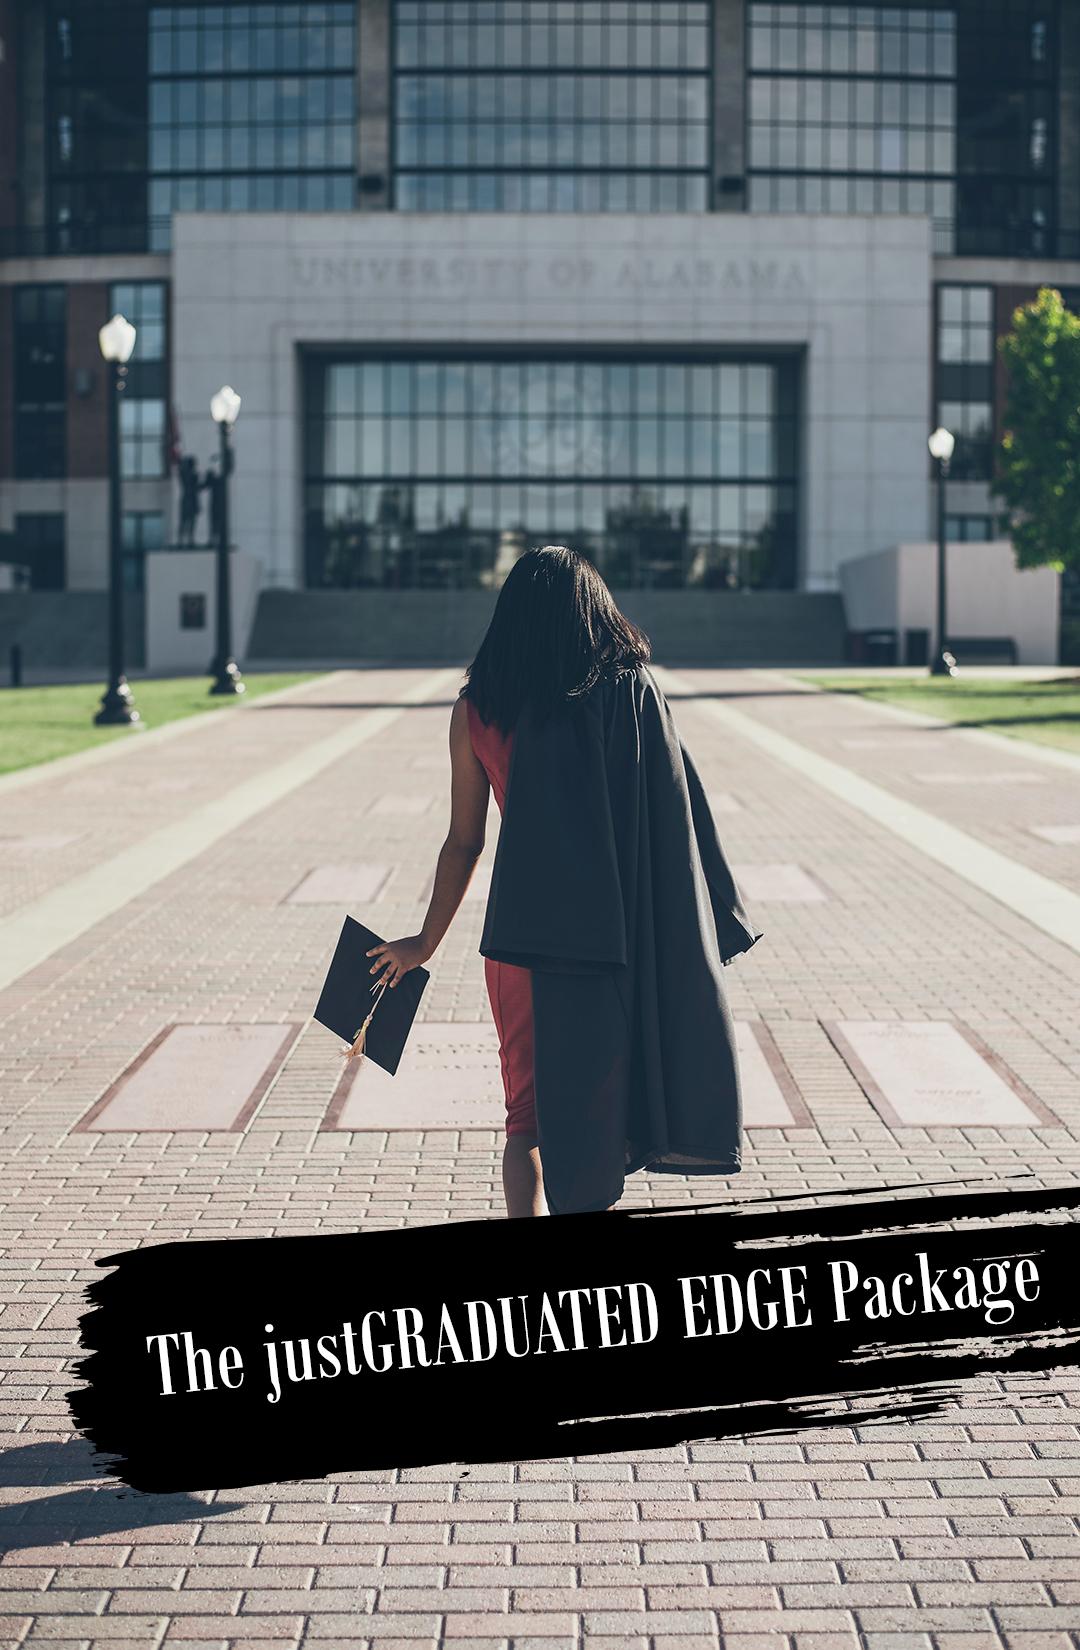 The justGRADUATED EDGE Package.jpg